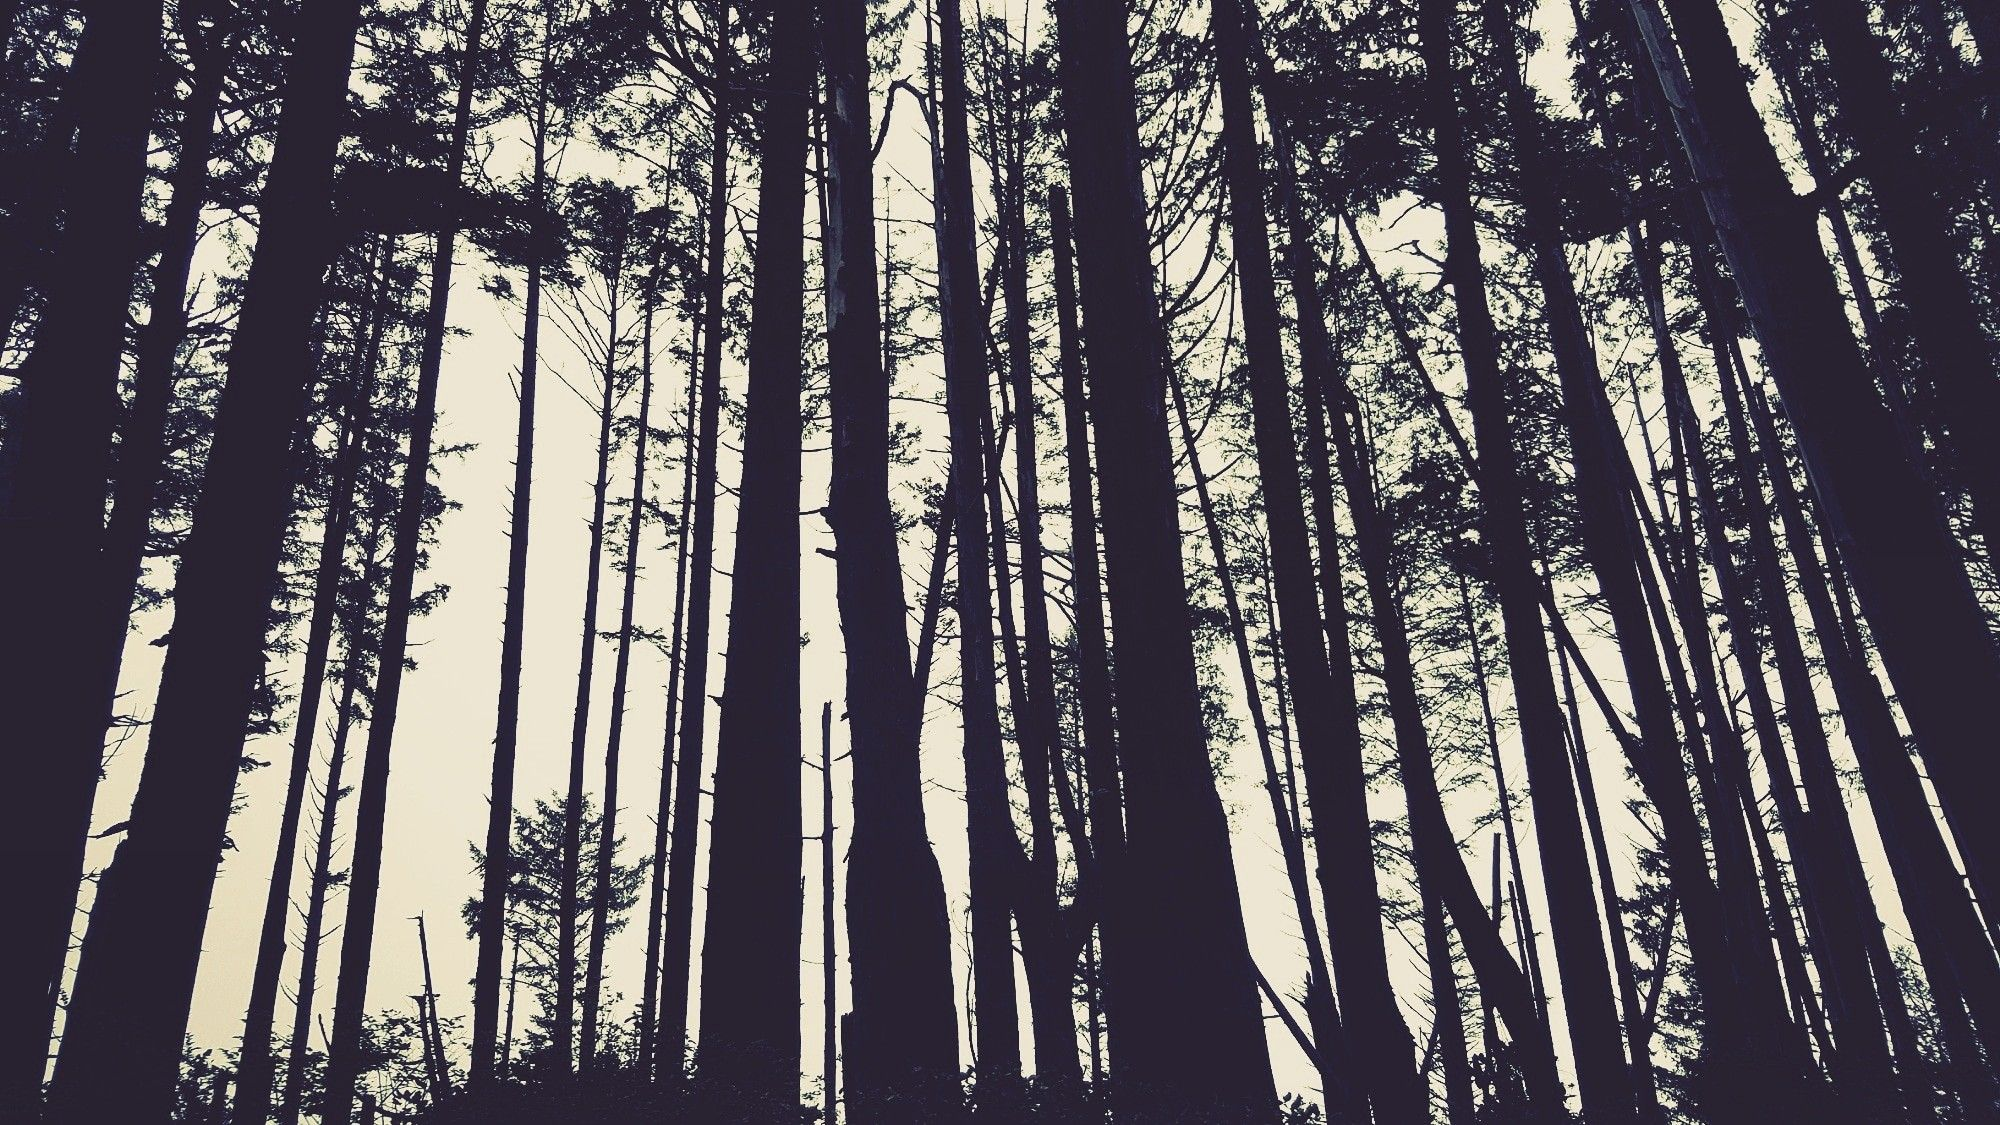 Hoh Rainforest Thespectrumworkshopcom